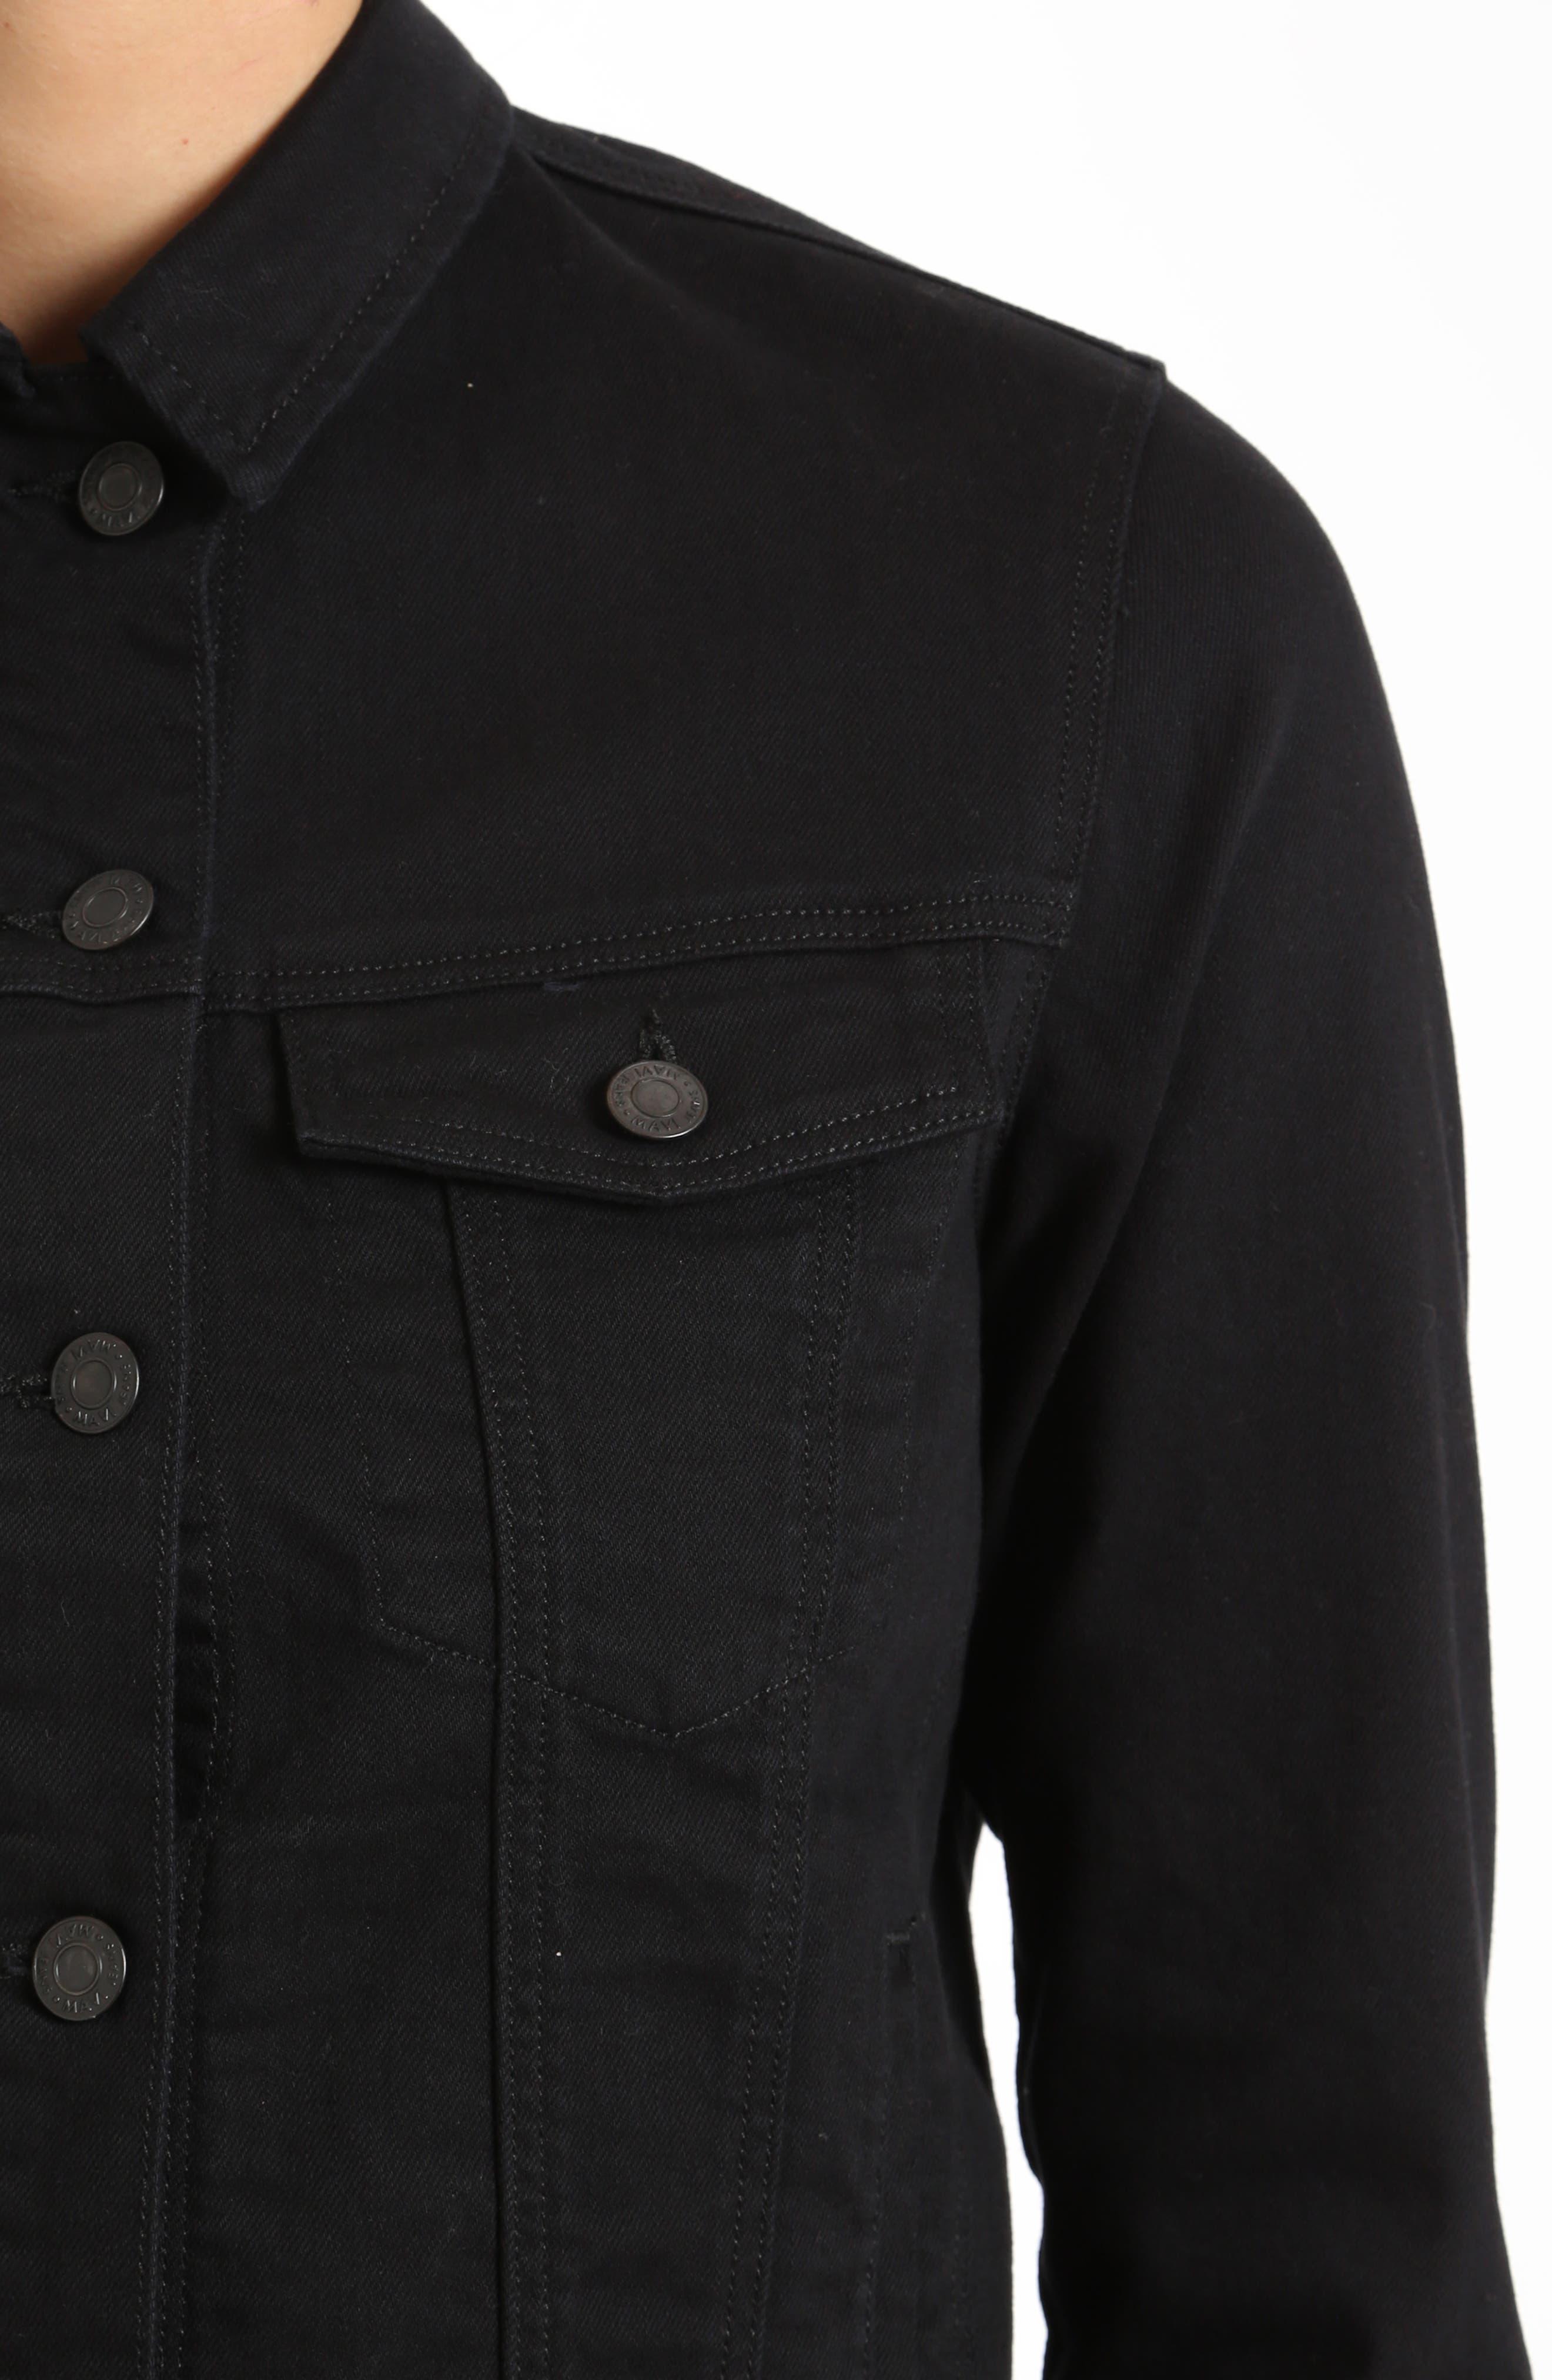 Katy Black Comfort Jacket,                             Alternate thumbnail 3, color,                             001